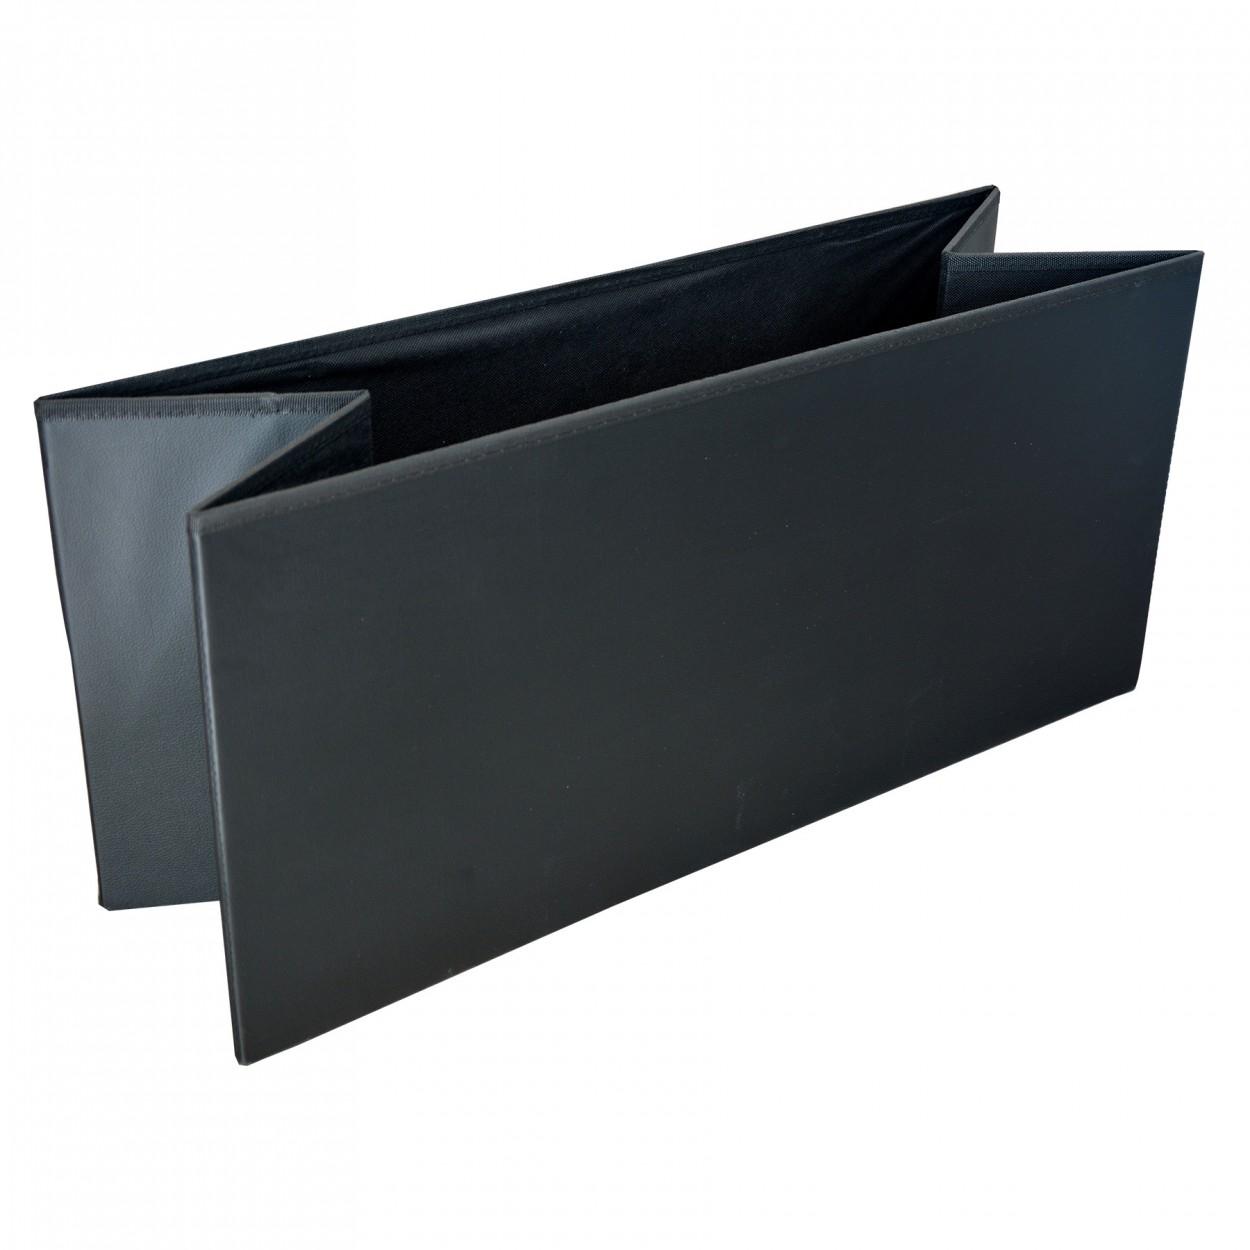 Dise/ño Original//Elegante 76x38x35cm.-Hogarymas Puff Negro Plegable para Almacenaje